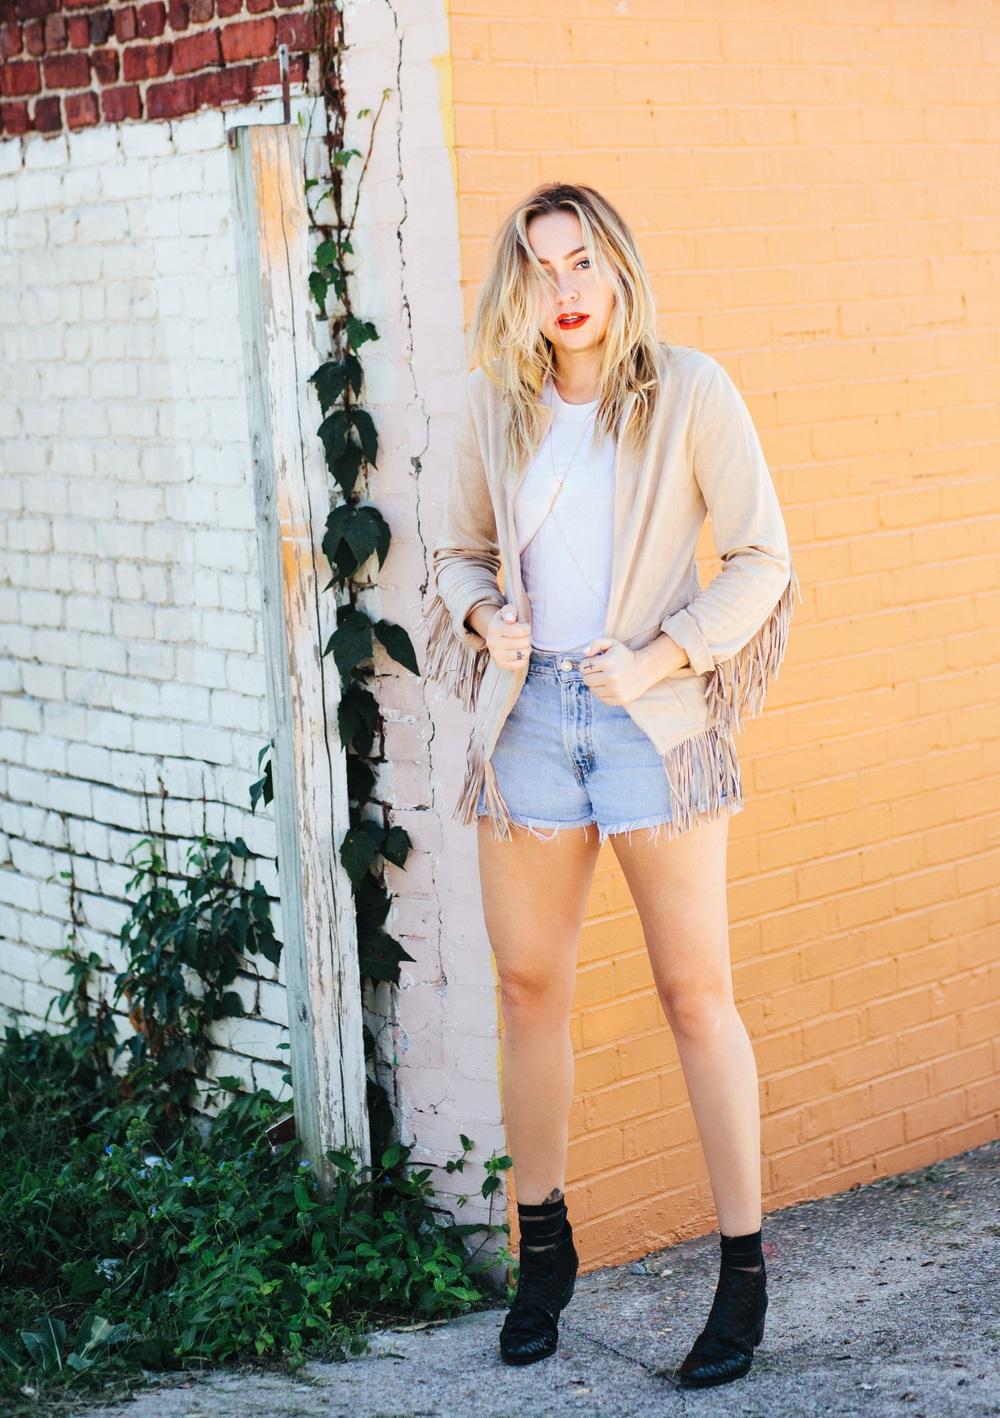 Jacket - Glamorous UK | Shorts - Levi's | Boots - Modern Vice | Socks - Ozone | Body Chain - Ivi Jewelry  || photos by Mandy Mooring